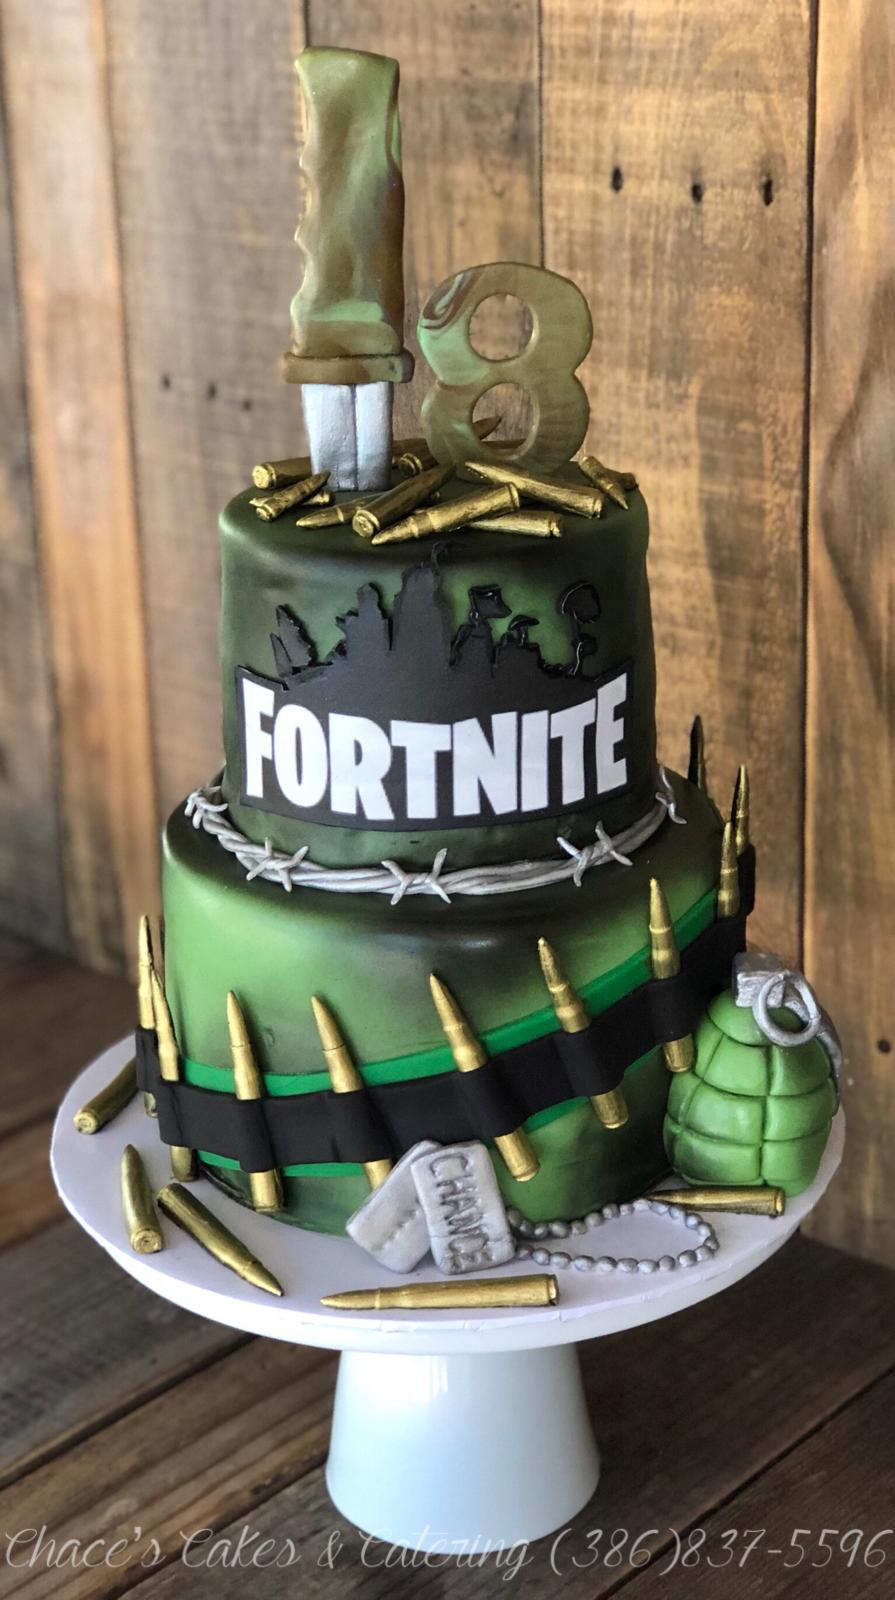 Fortnite Game Fondant 17 Tier Birthday Cake  Torta para fiesta